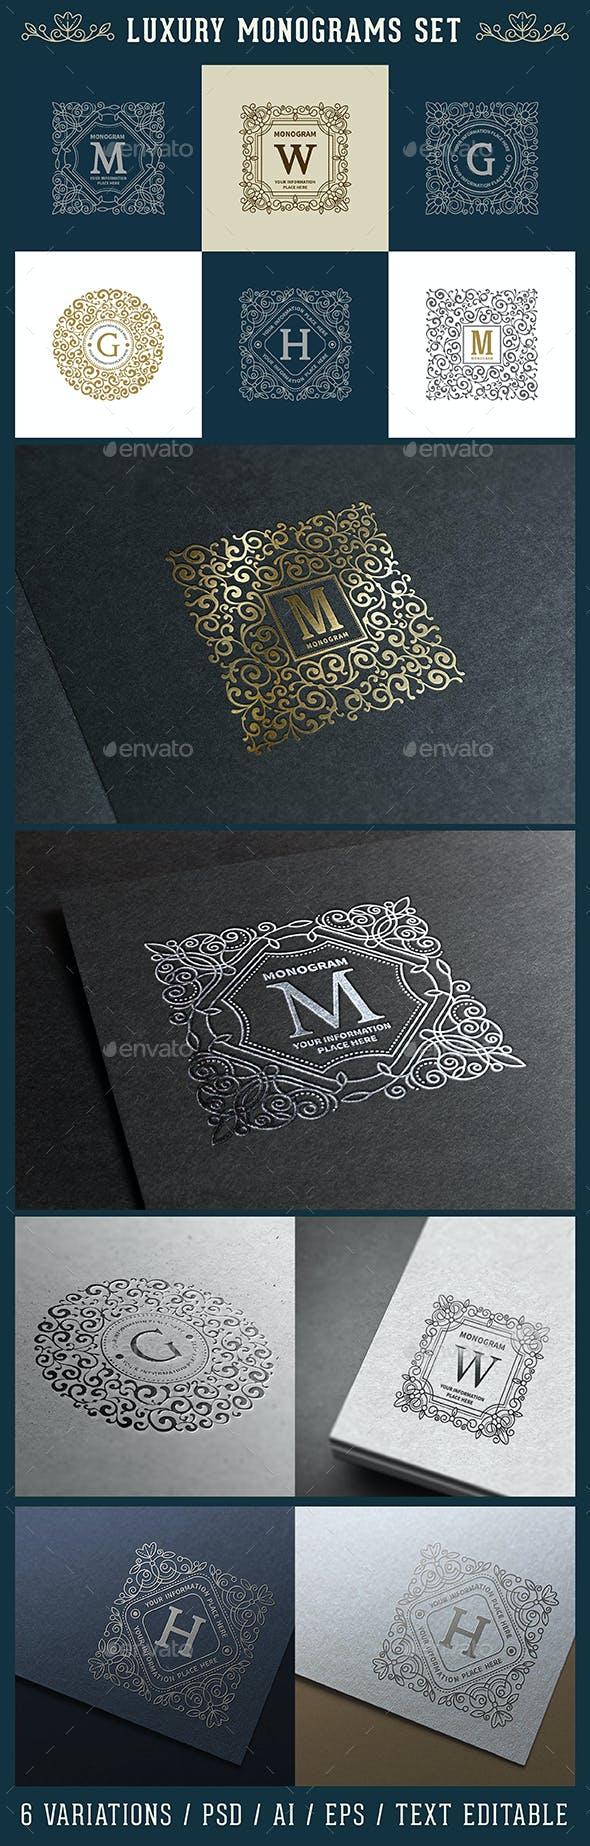 luxury logo and monogram set by mari pazhyna graphicriver